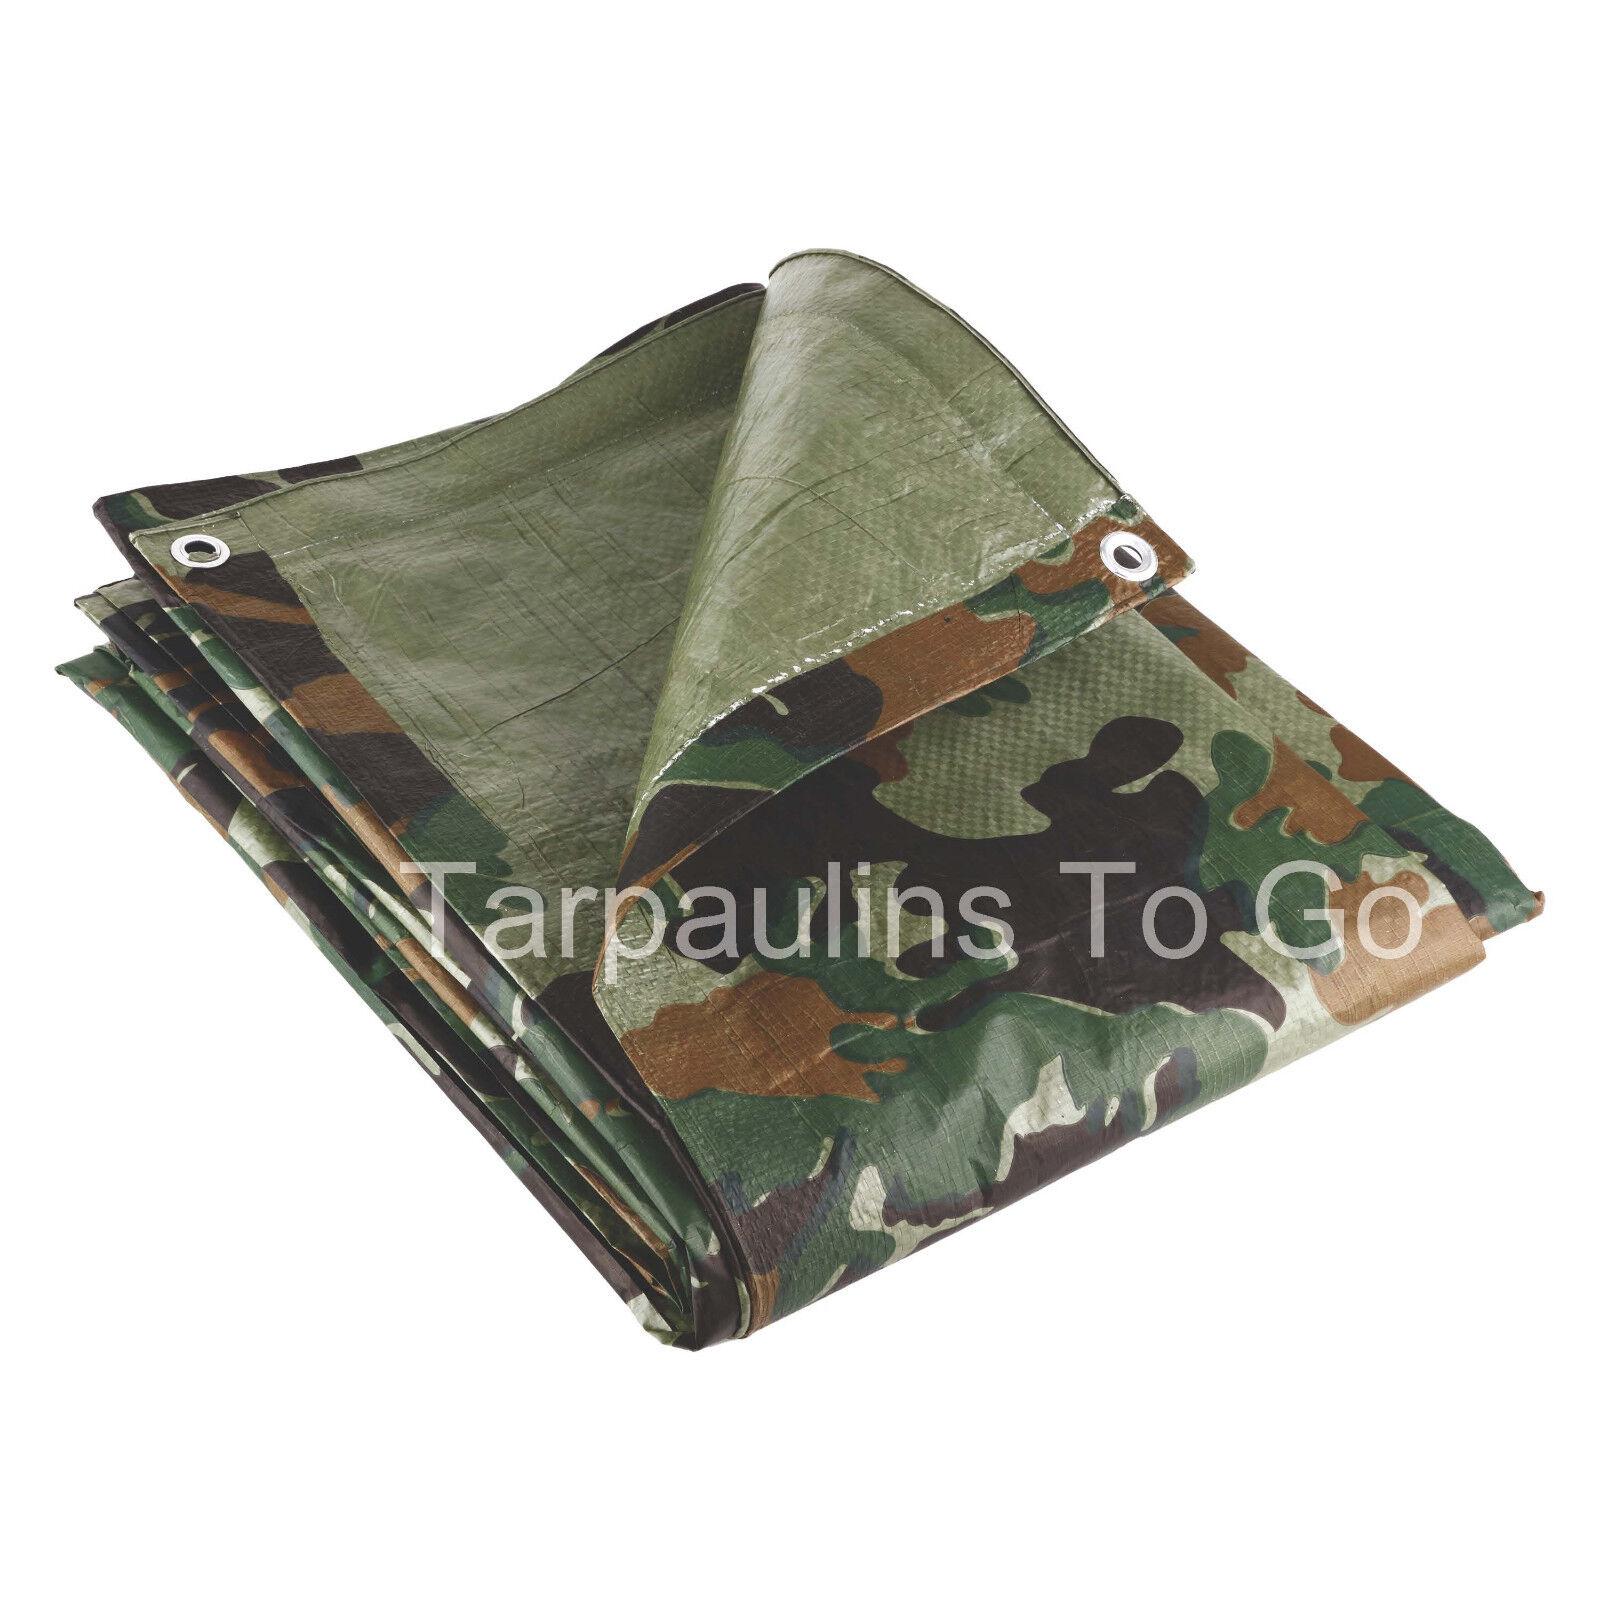 Waterproof Tarpaulin Ground Sheet Lightweight Camping Cover Tarp with Eyelets - 4